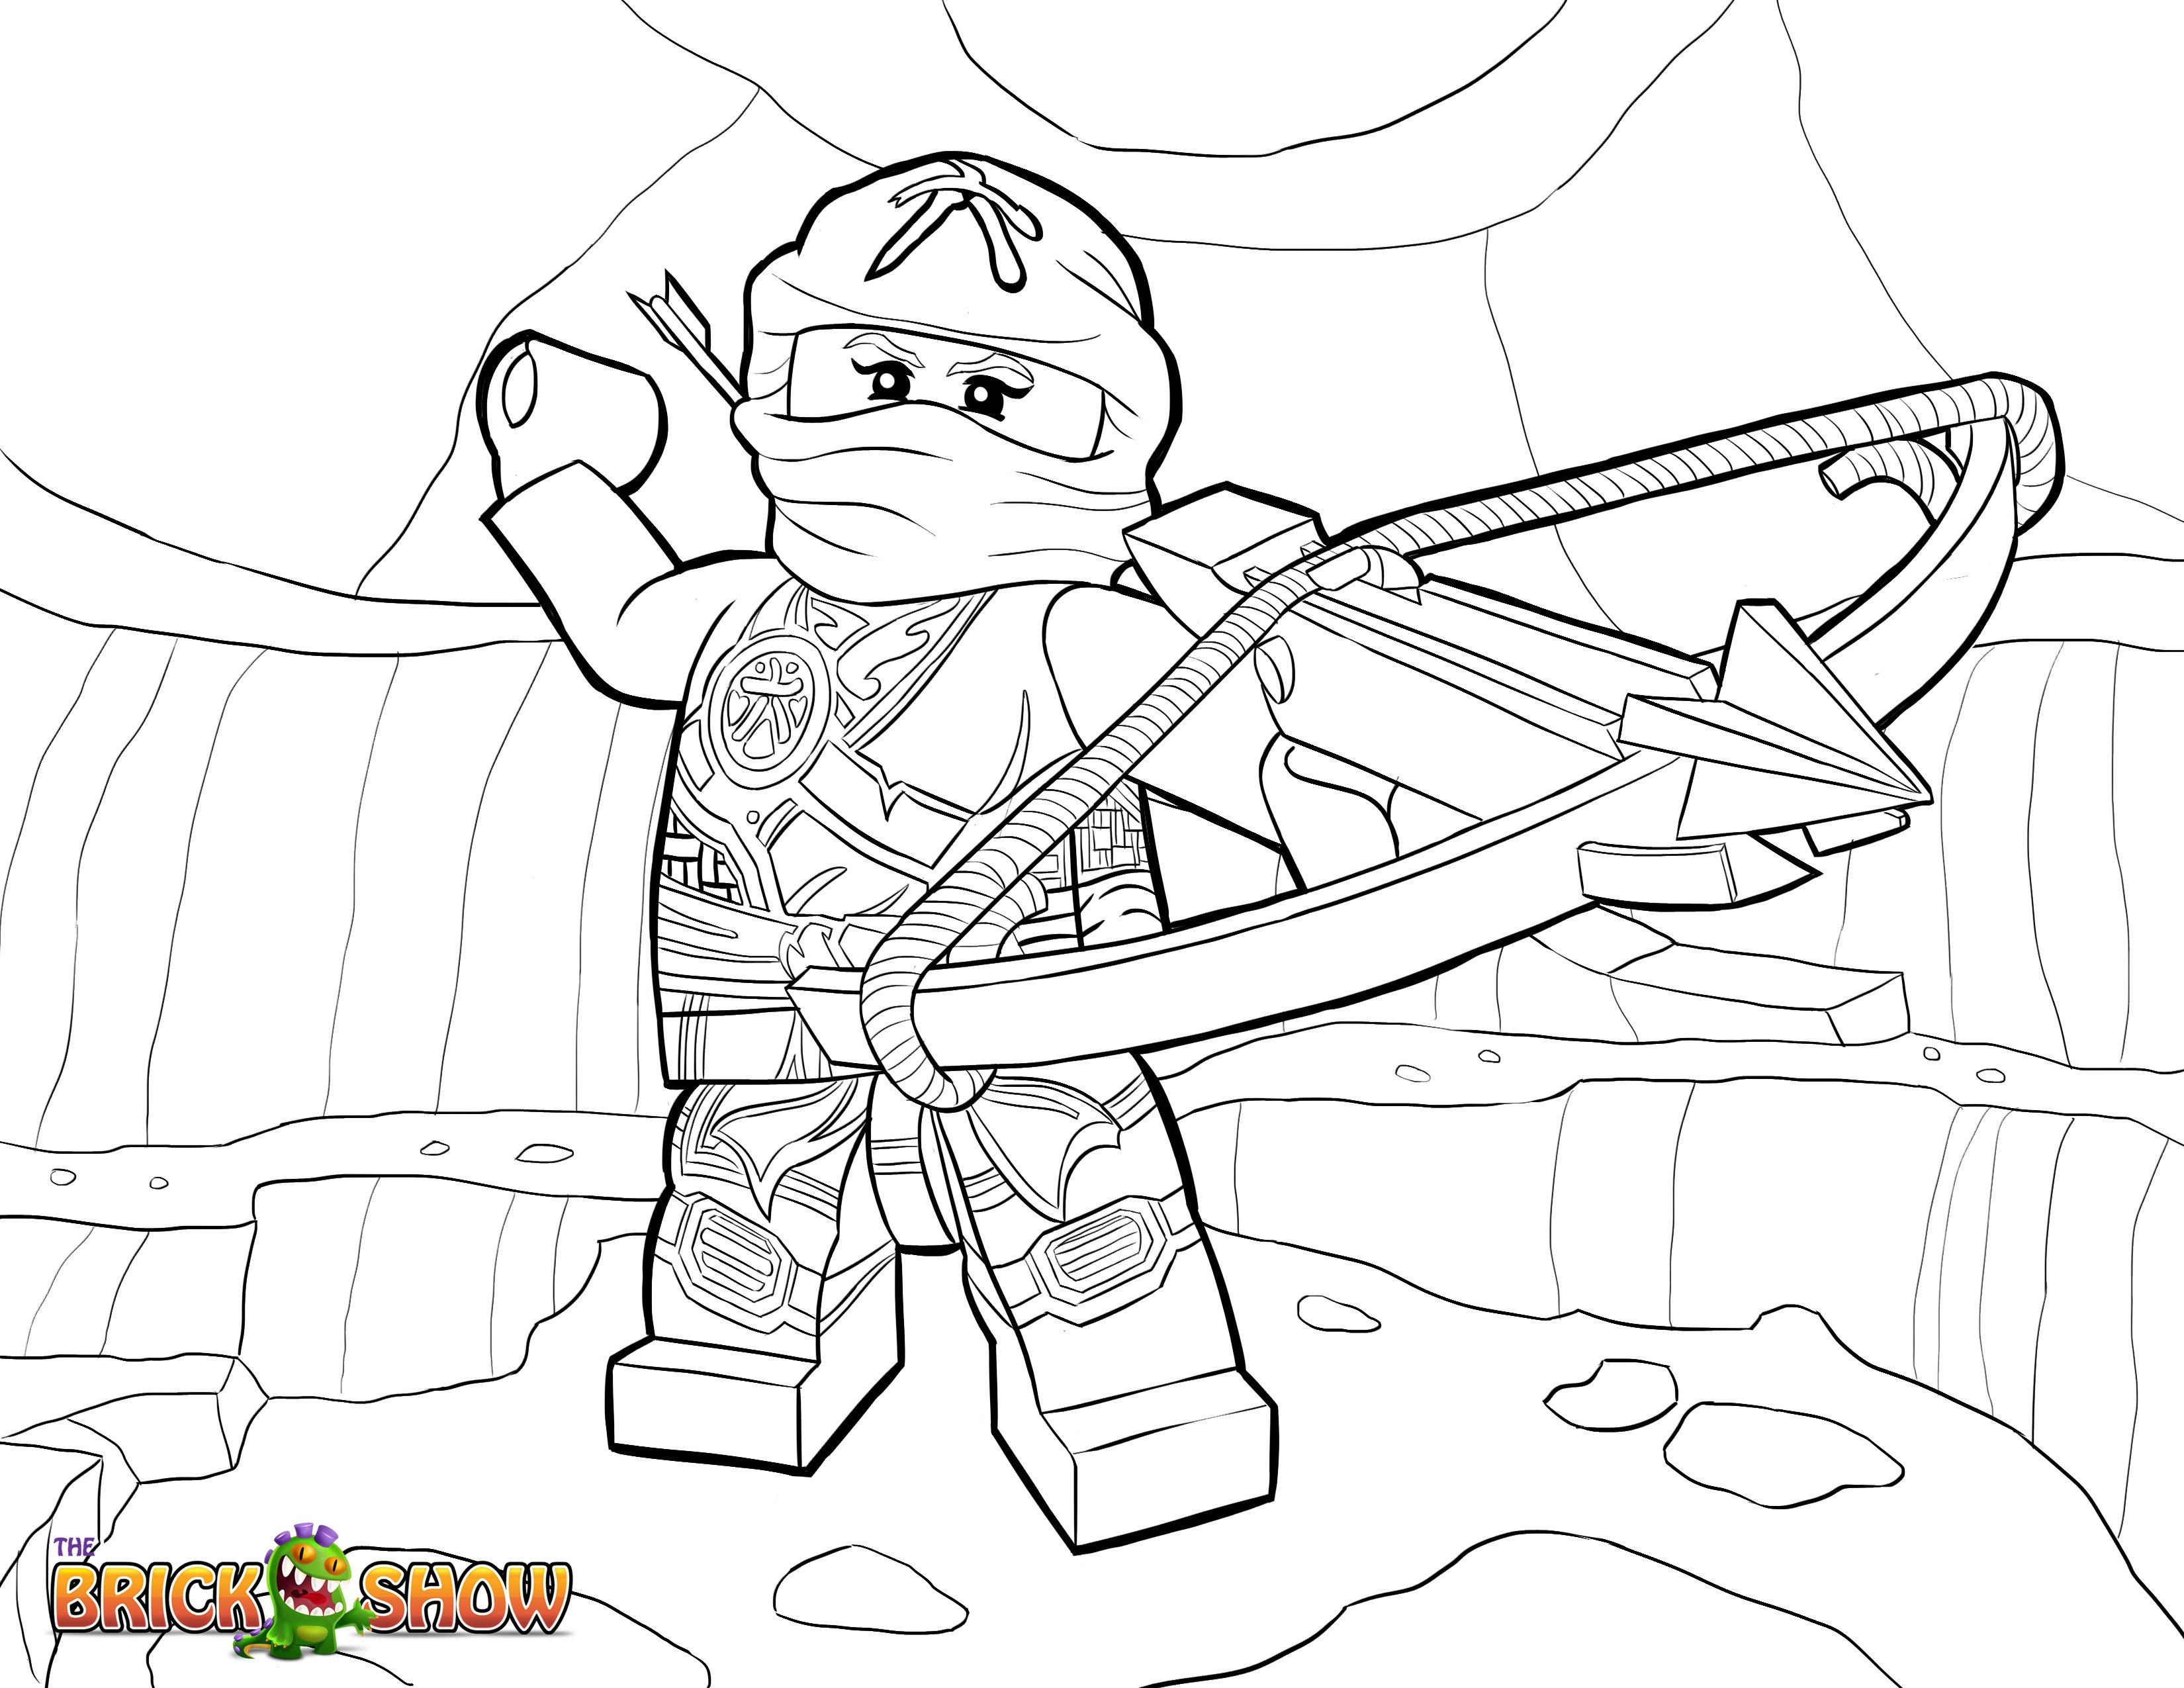 Lego Ninjago Zum Ausmalen Das Beste Von 40 Ninjago Ausmalbilder Zane Scoredatscore Frisch Lego Ninjago Galerie